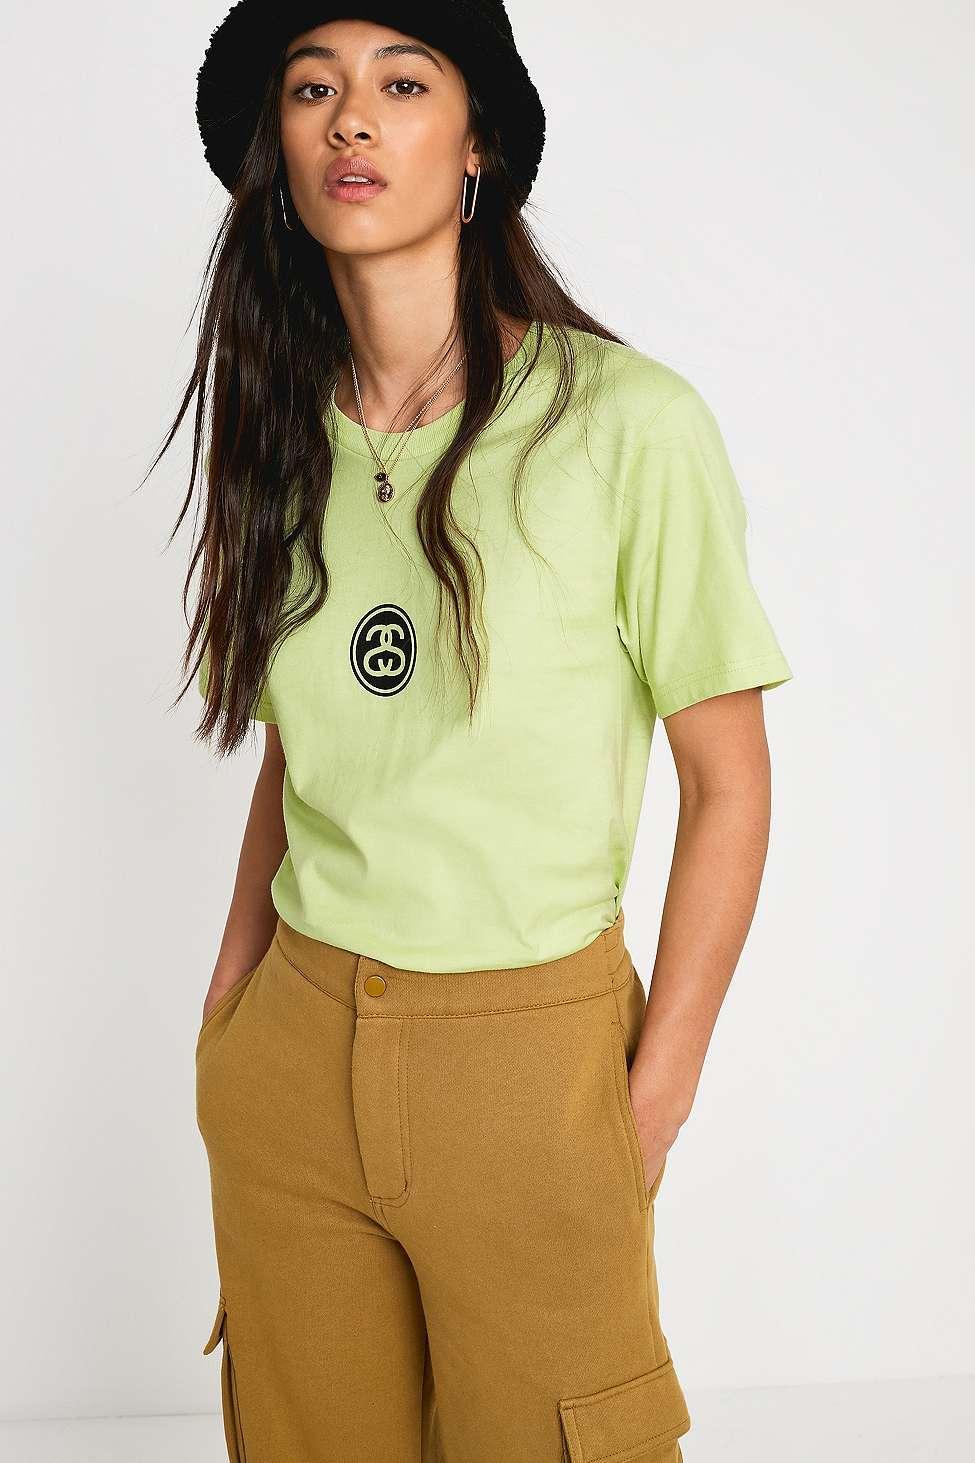 683b0966b Stussy Link Pale Green T-shirt - Womens Xs in Green - Lyst